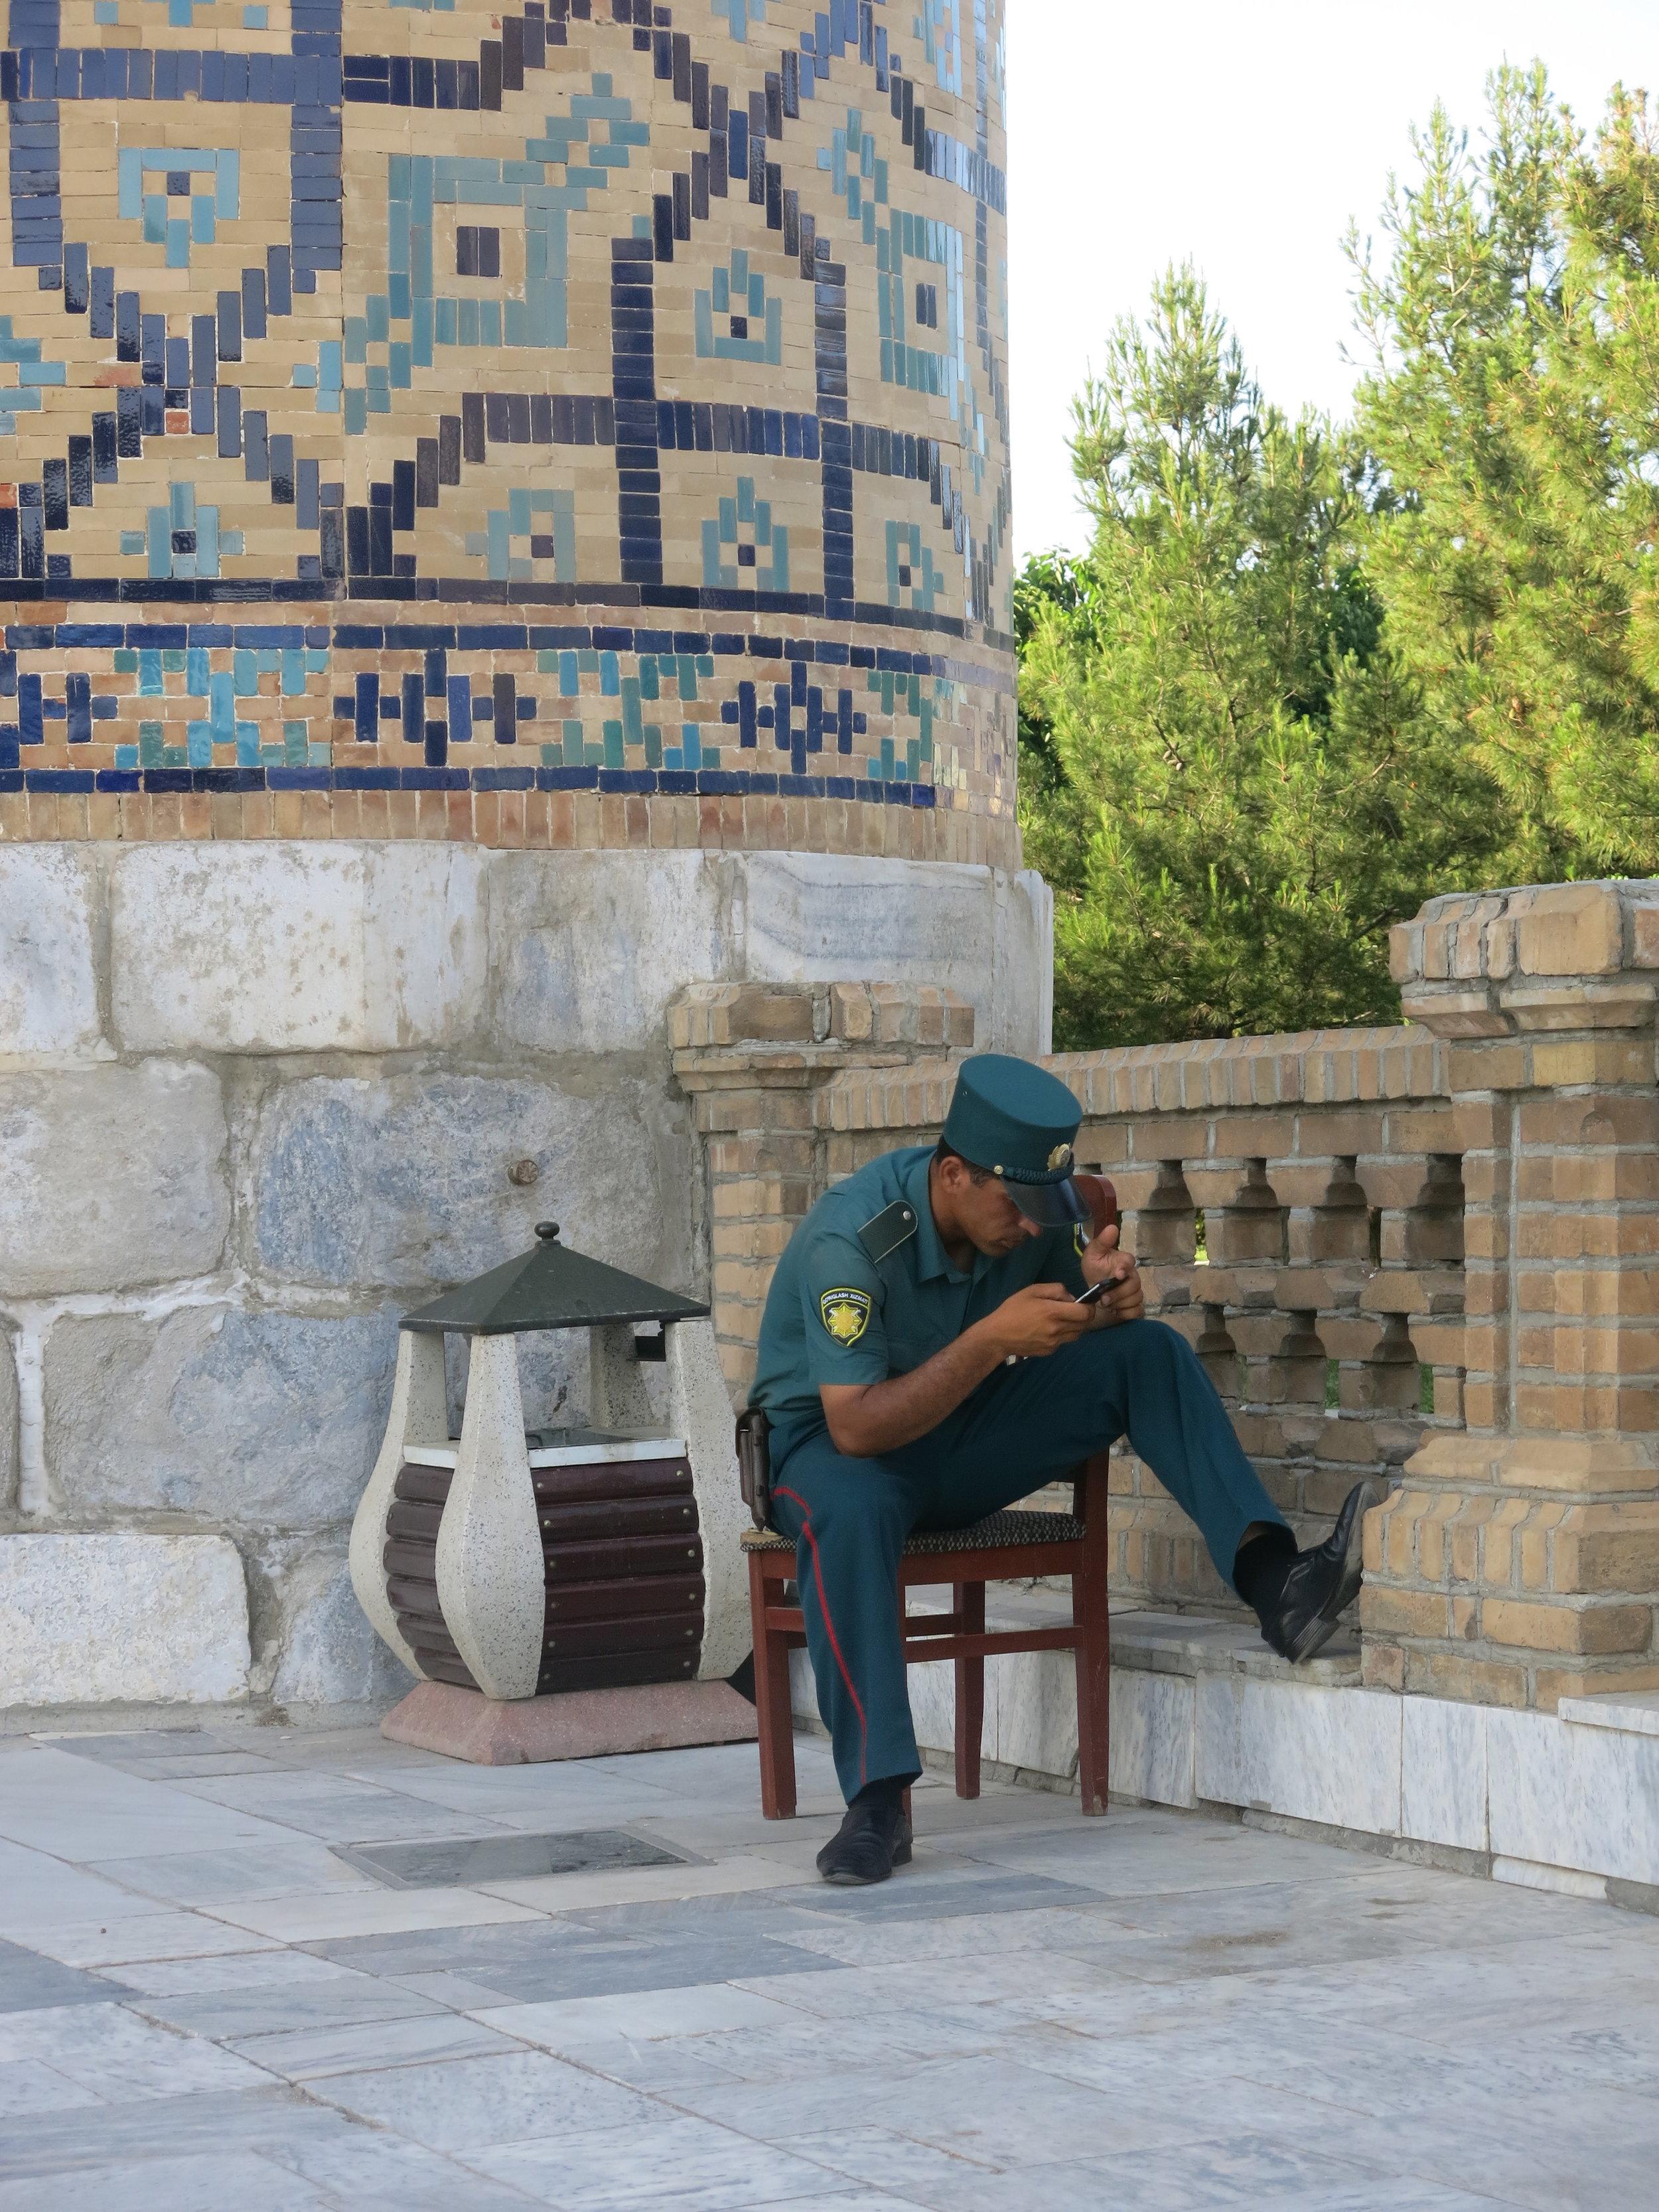 Uzbek policeman on duty at the Registan square